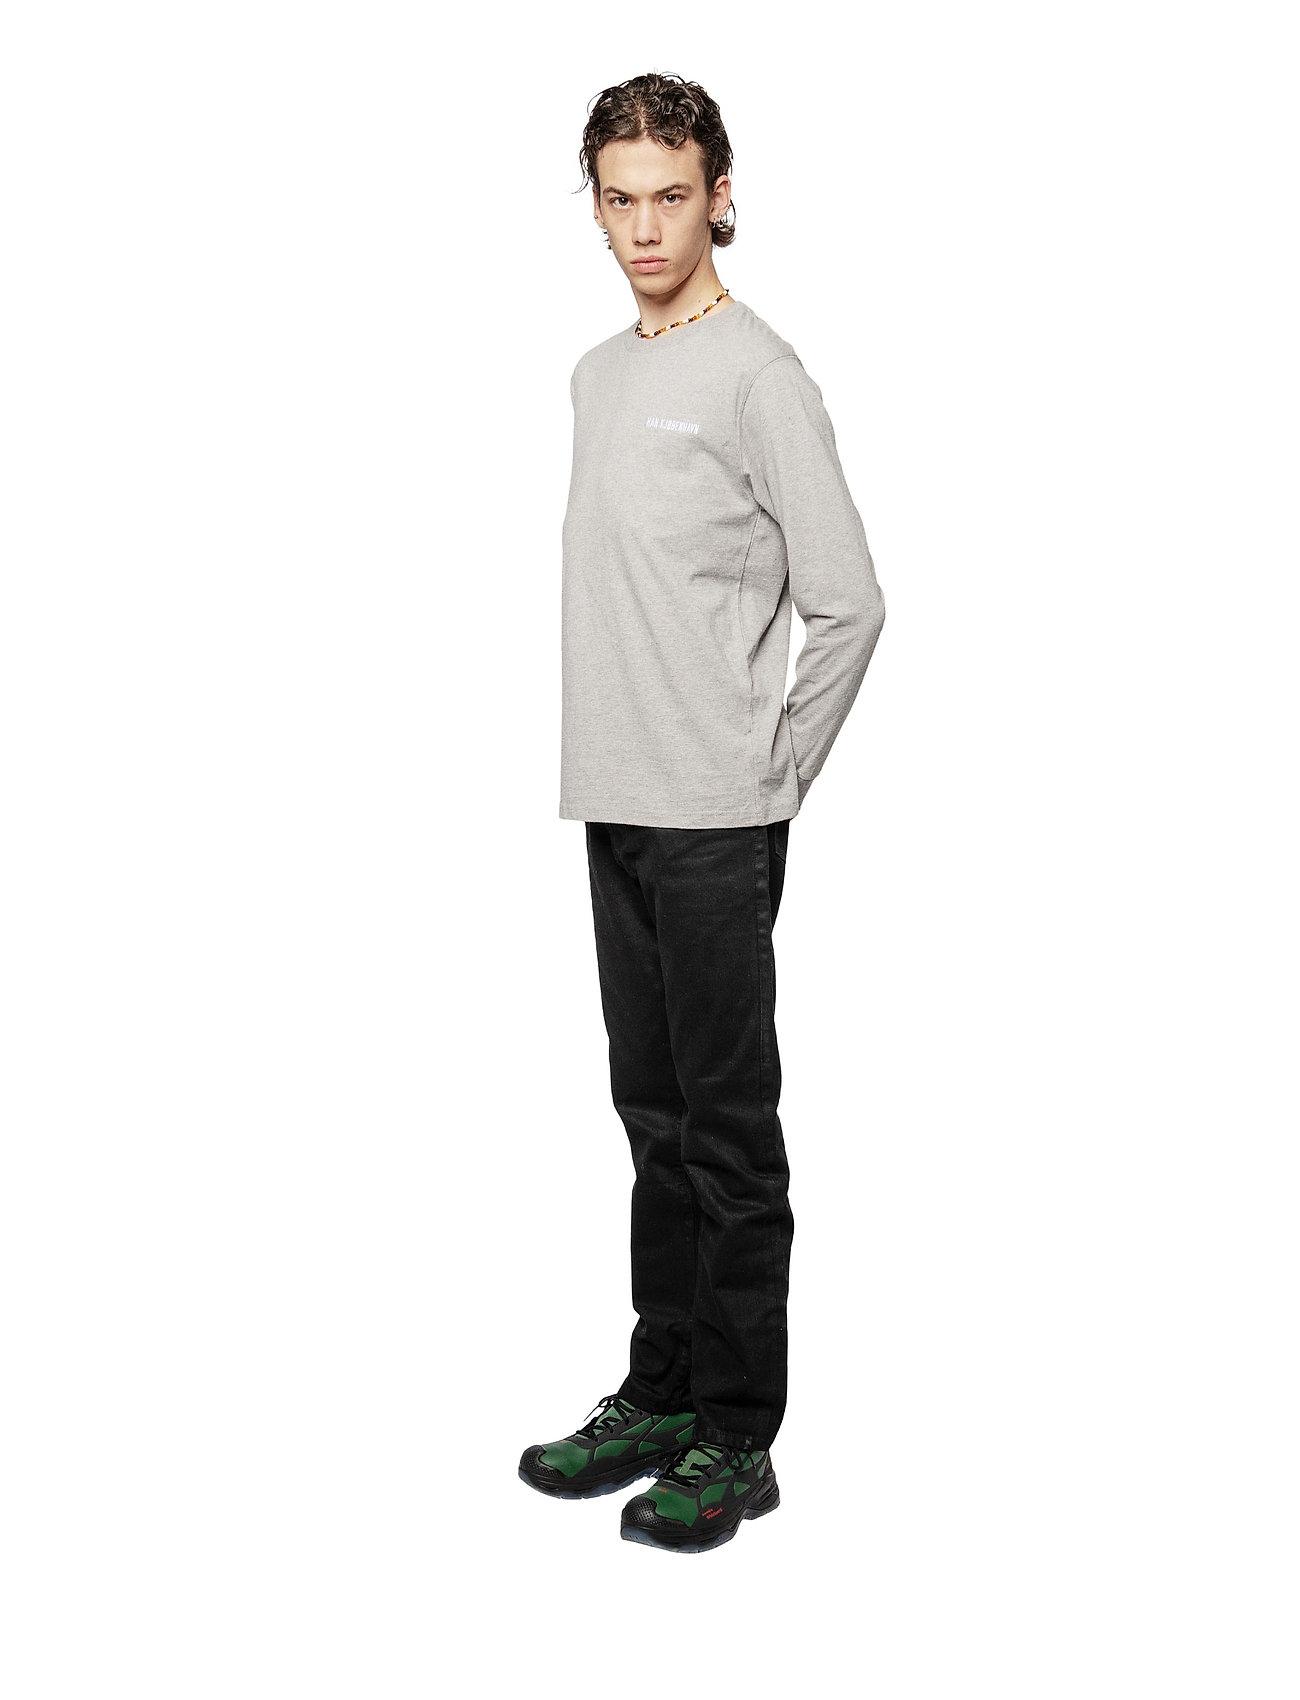 HAN Kjøbenhavn - Casual Long Sleeve Tee - basic t-shirts - grey logo - 3